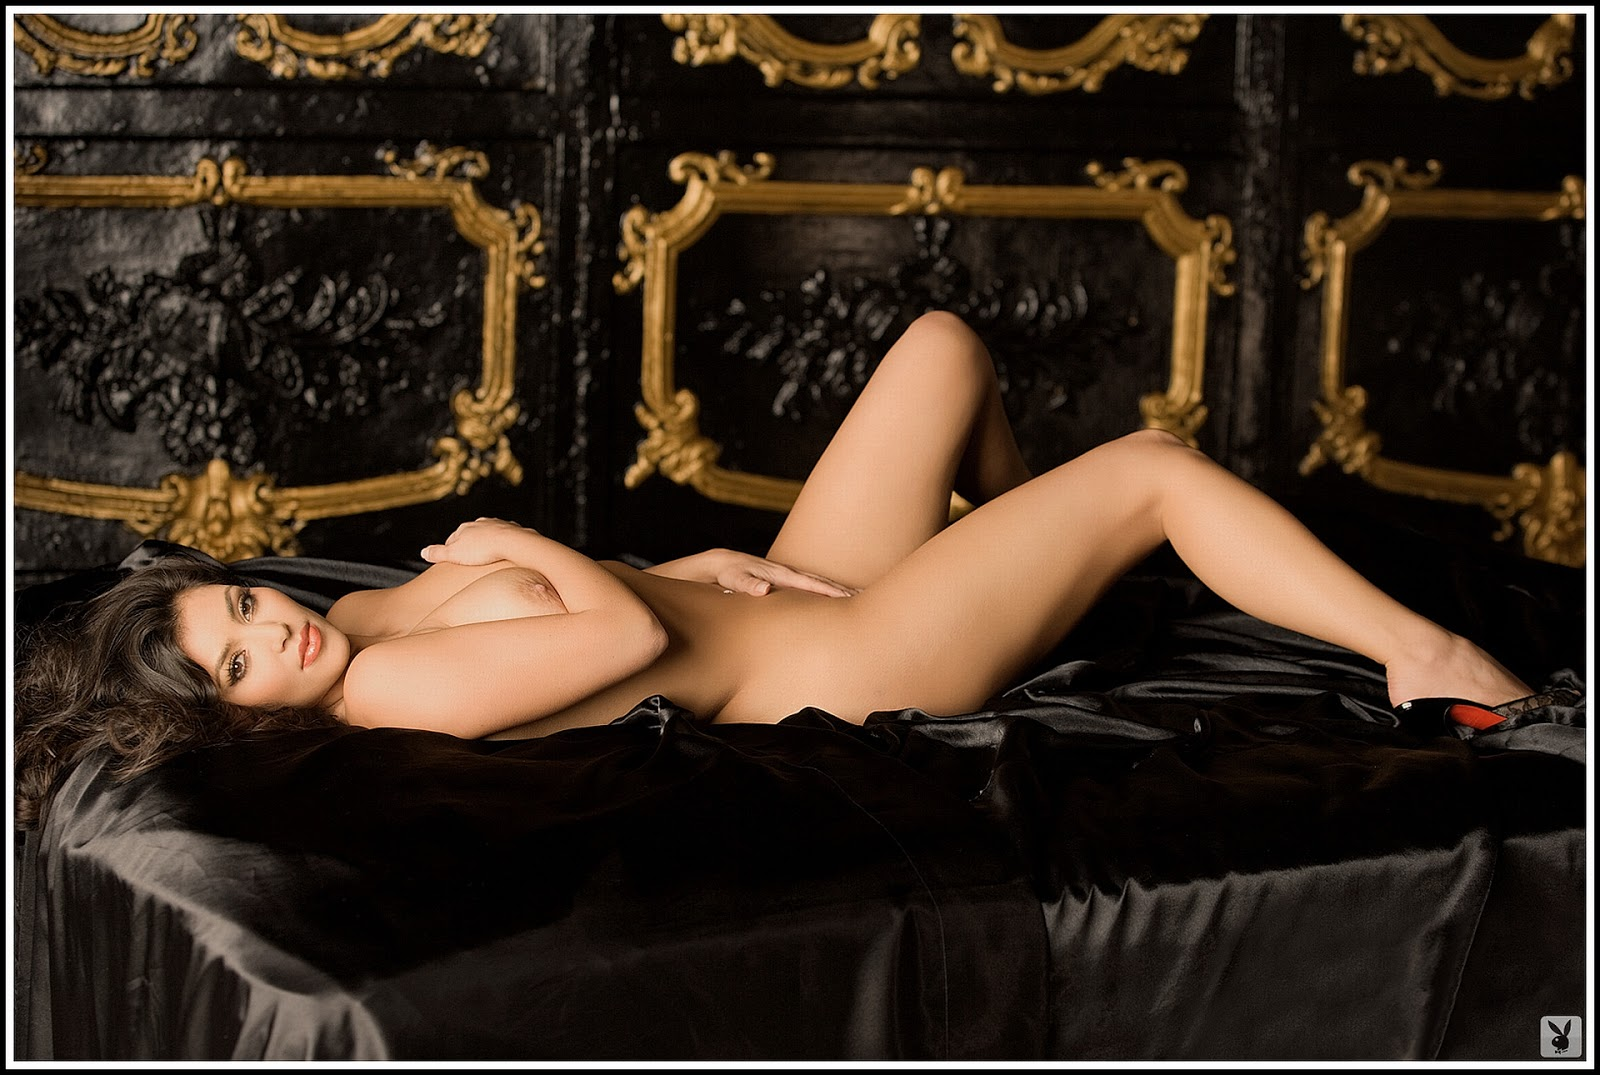 naughty touching girls naked